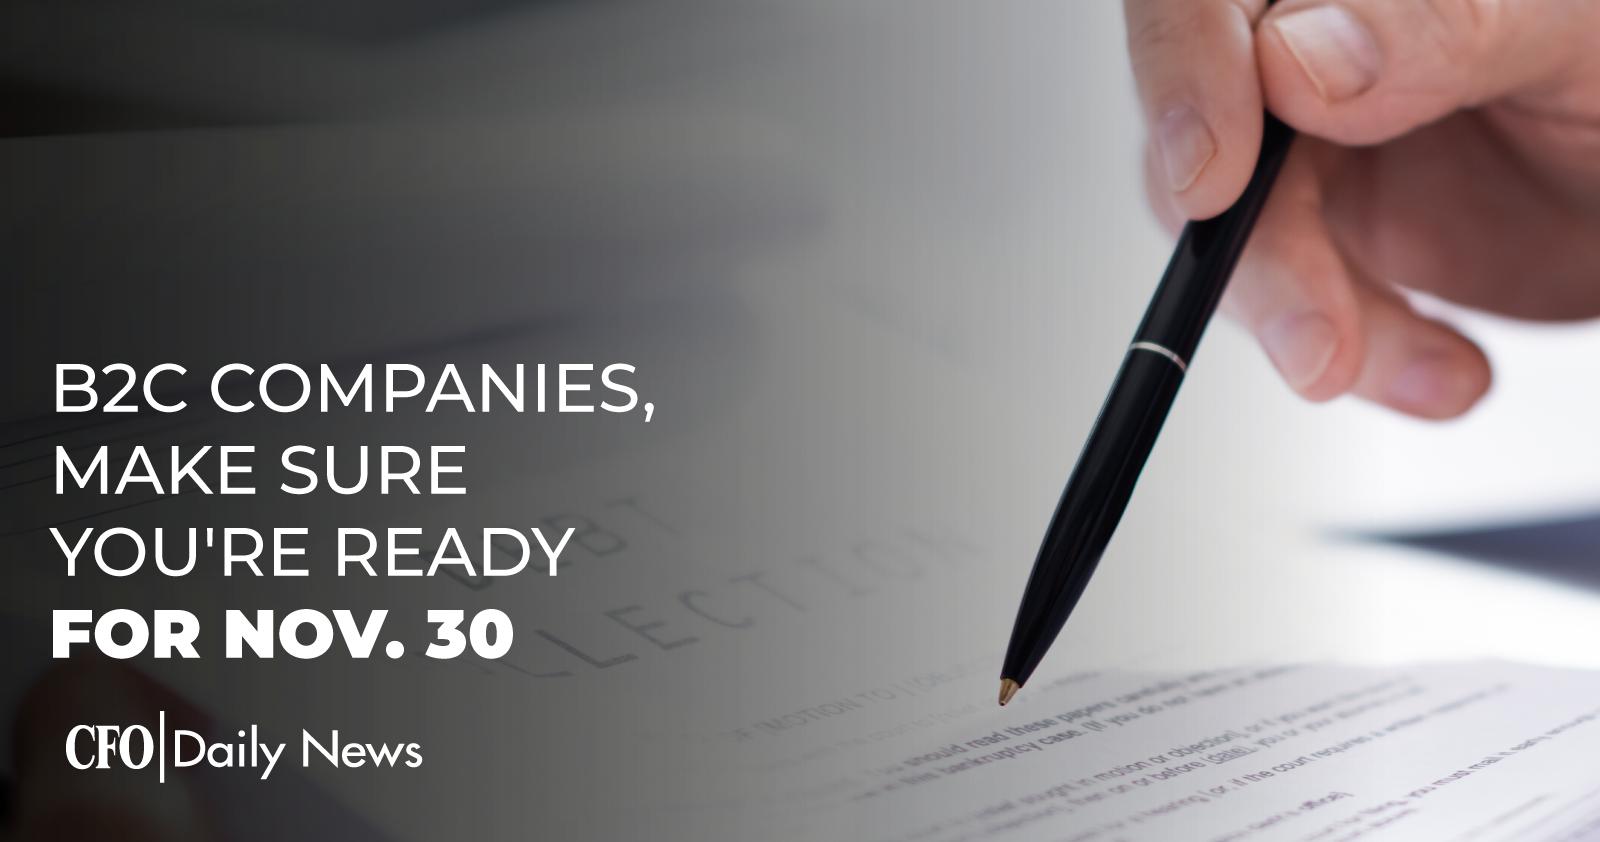 B2C Companies Make Sure You're Ready For Nov. 30